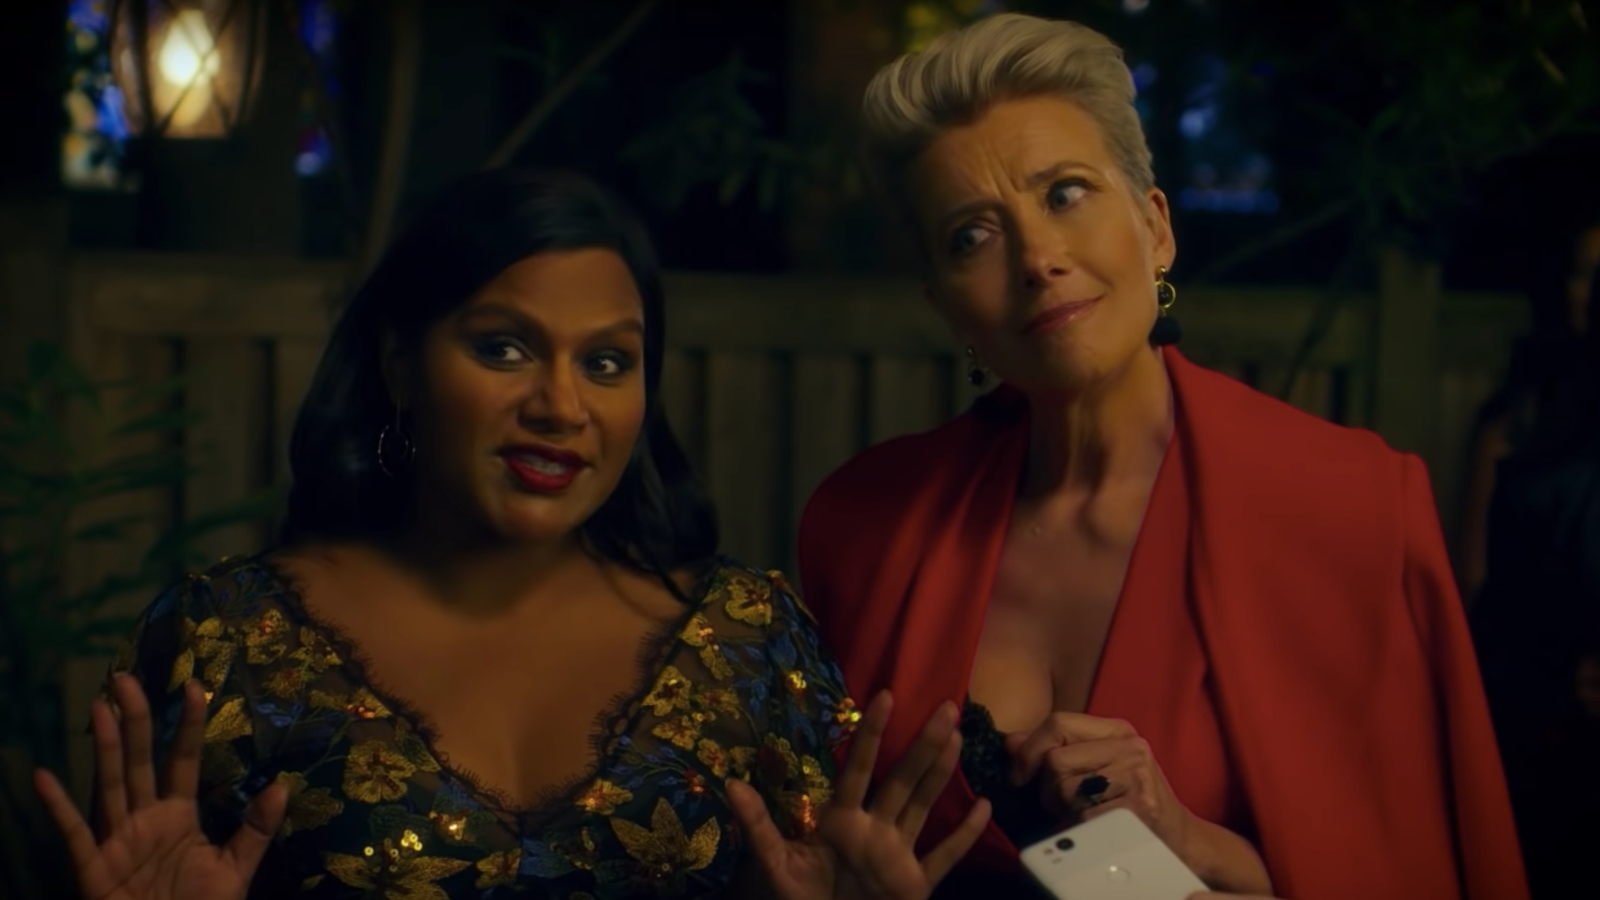 Late Night's Retrograde Views of Women in Comedy